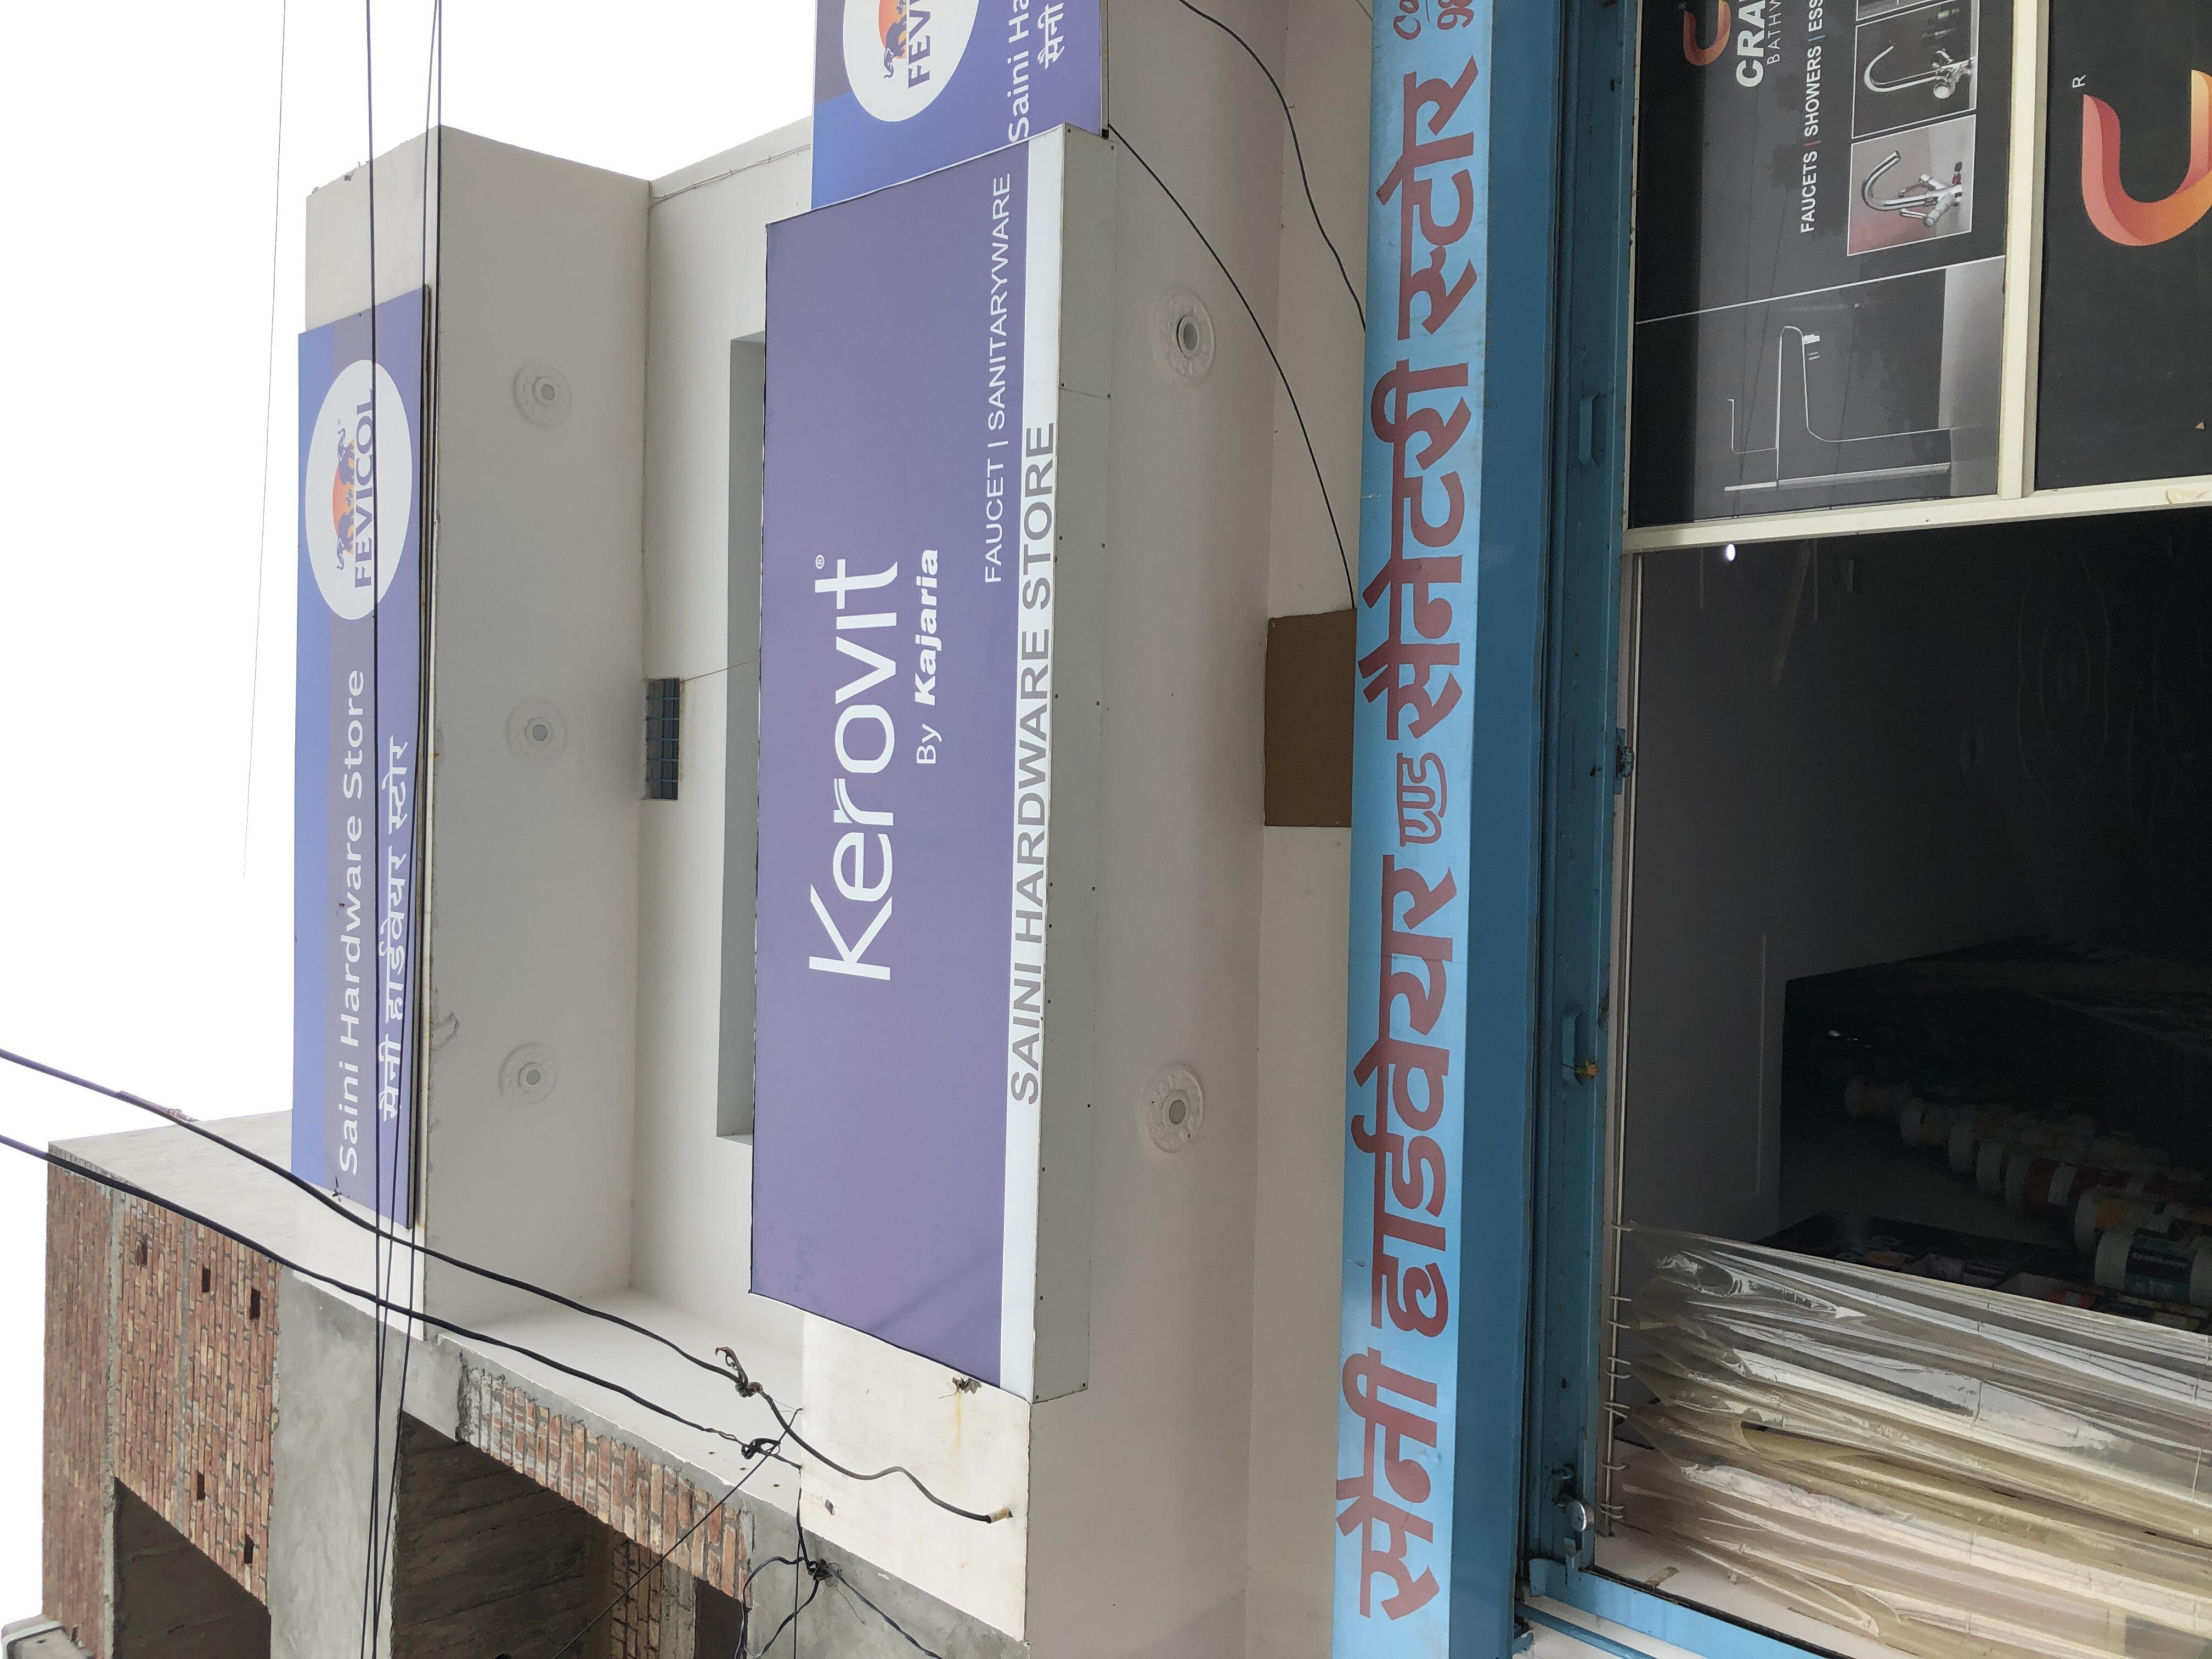 Saini Hardware store